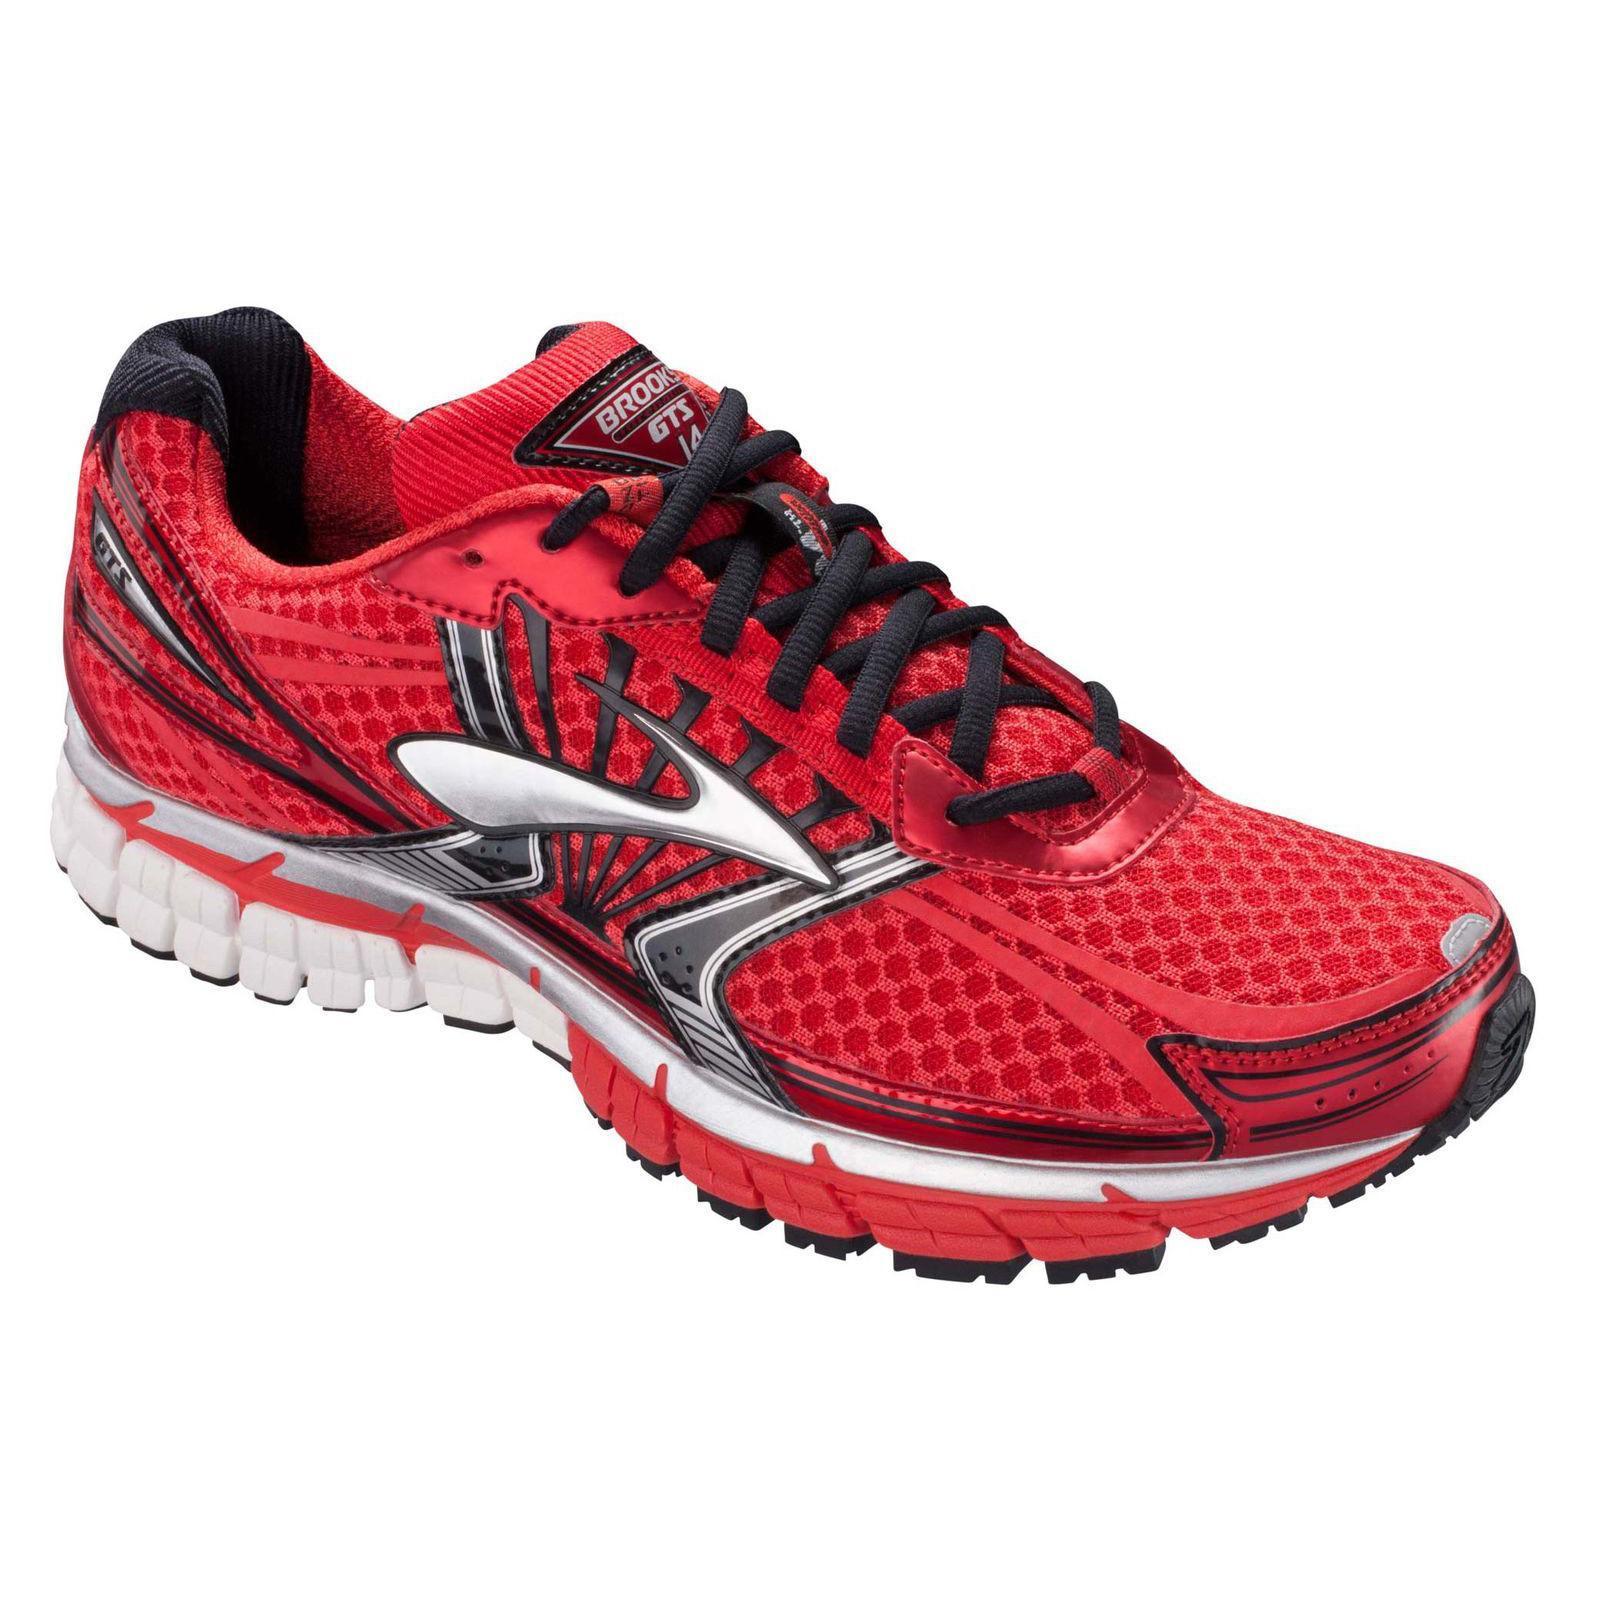 272a904ed89aa Brooks Mens Adrenaline GTS 14 Running Shoes - Red - Tennisnuts.com